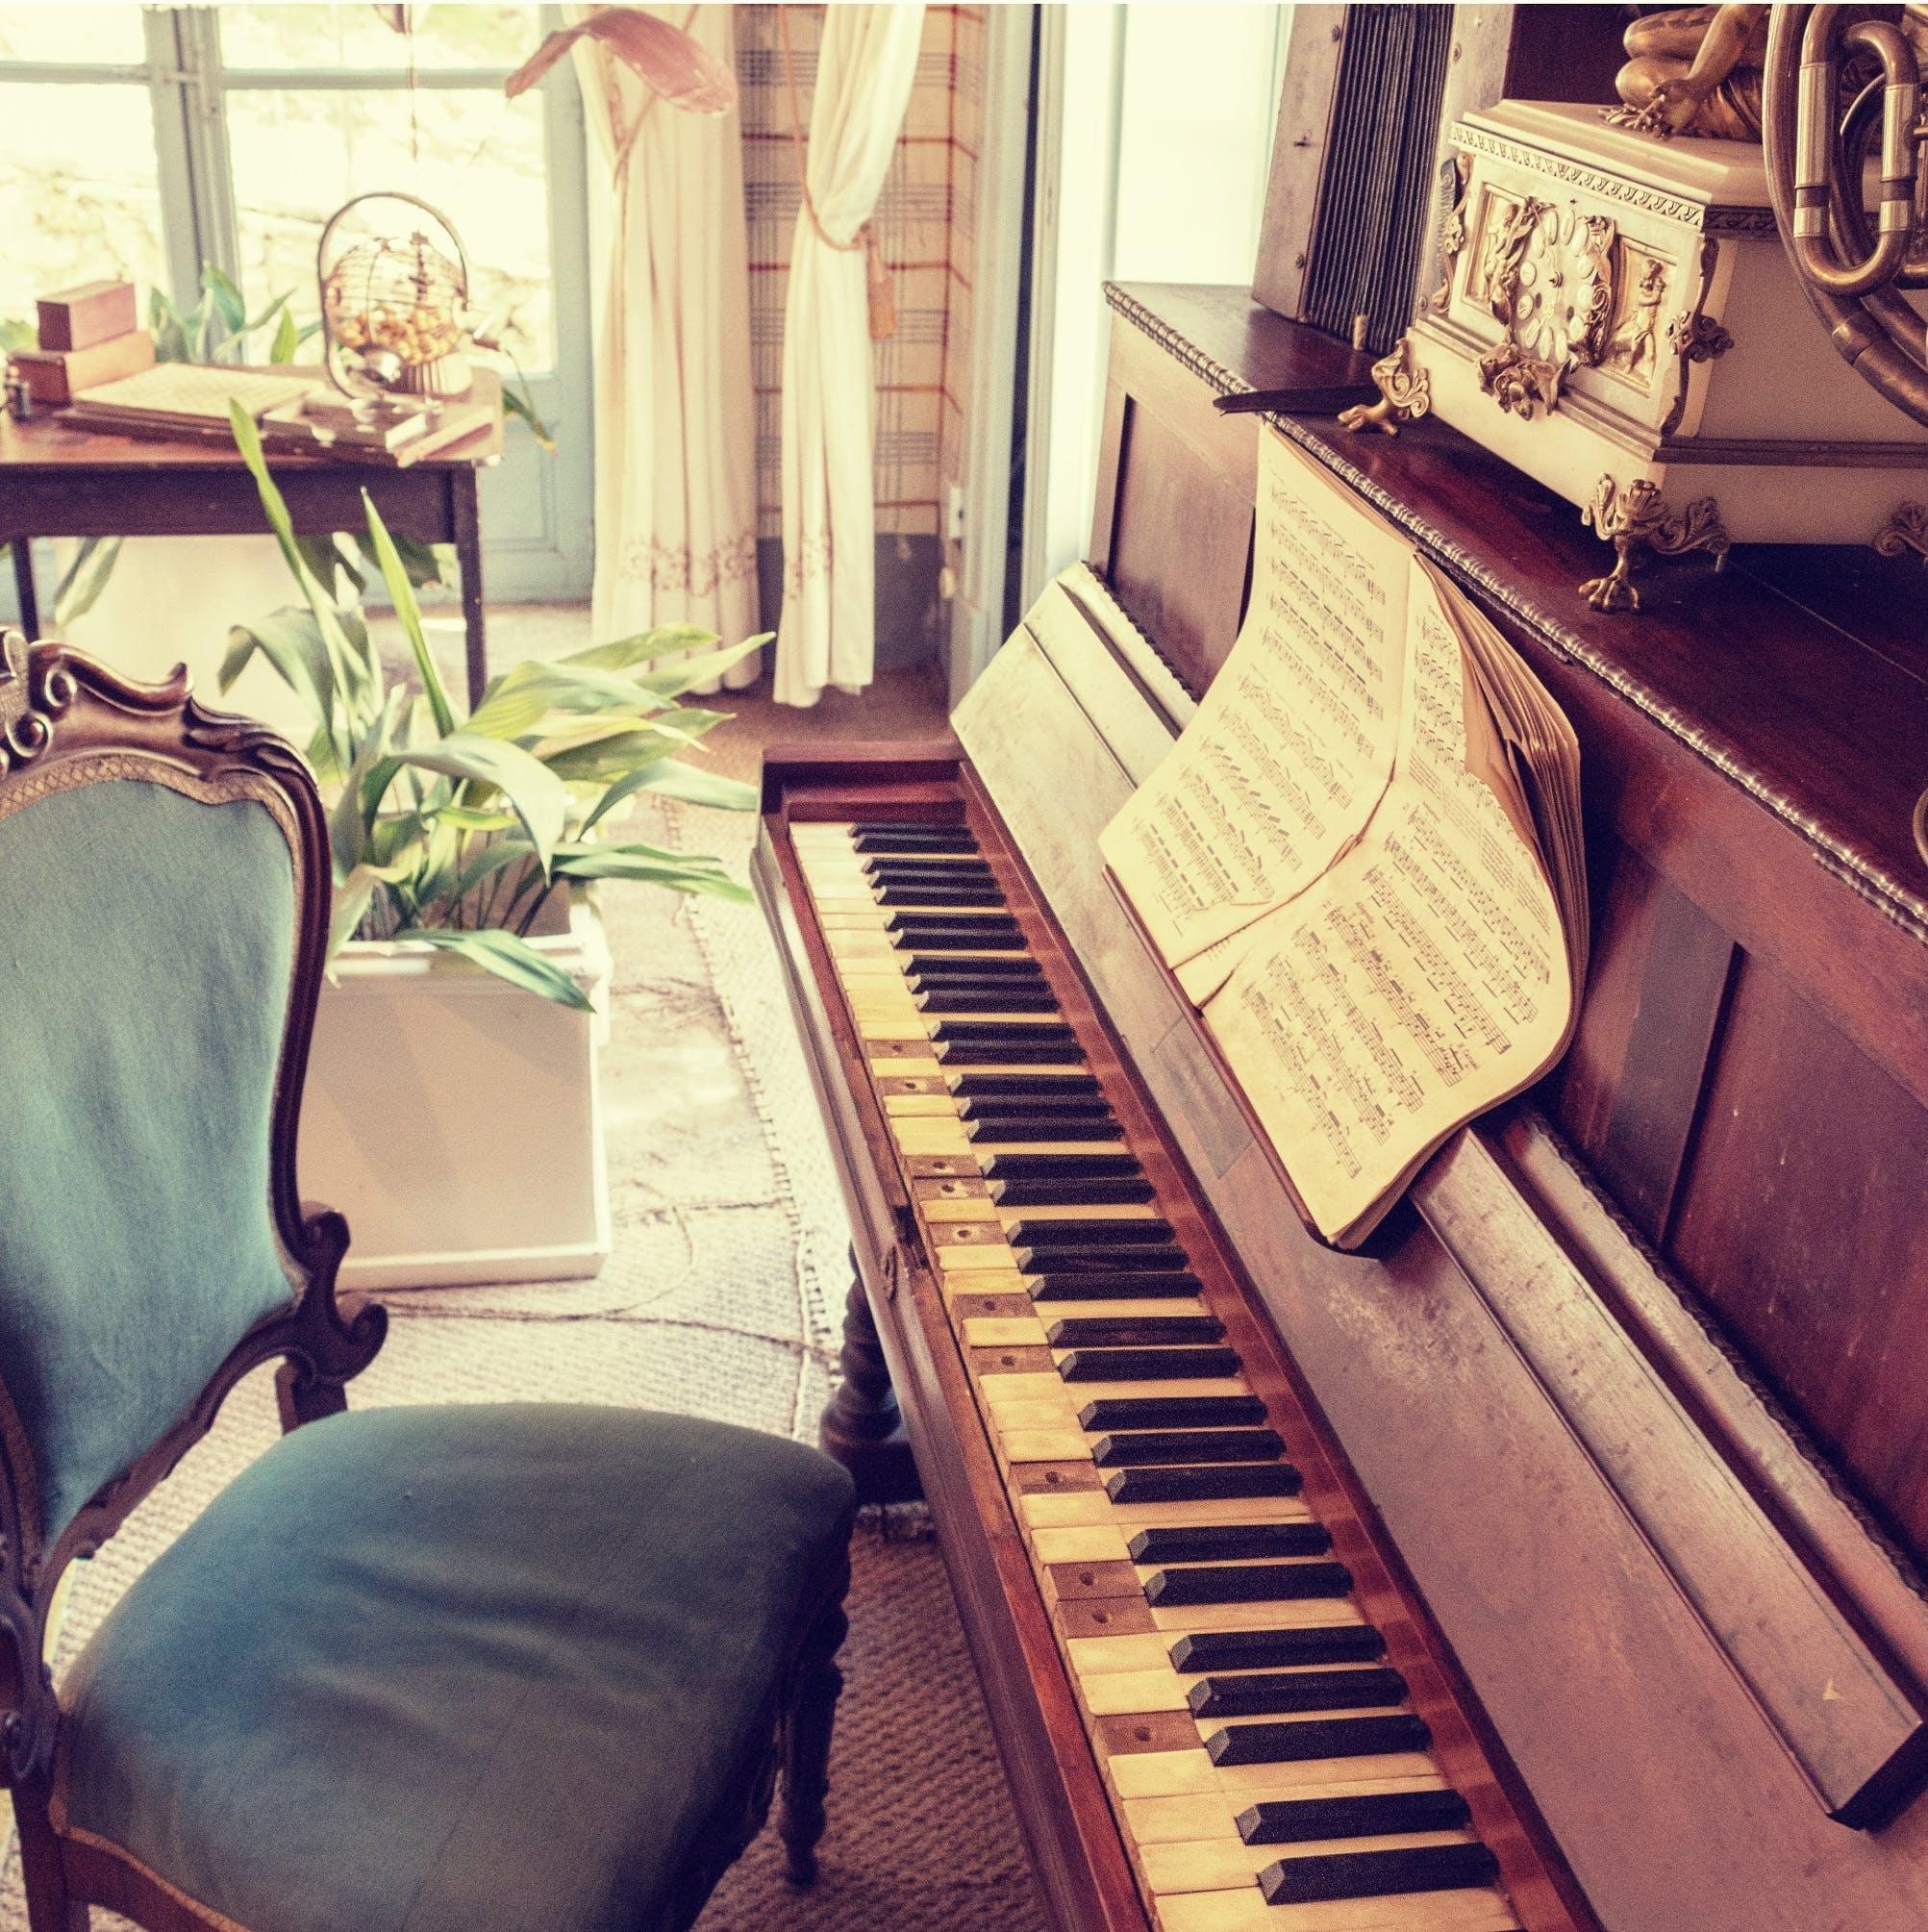 Безкоштовне стокове фото на тему «музика, музичний інструмент, ноти, стілець»